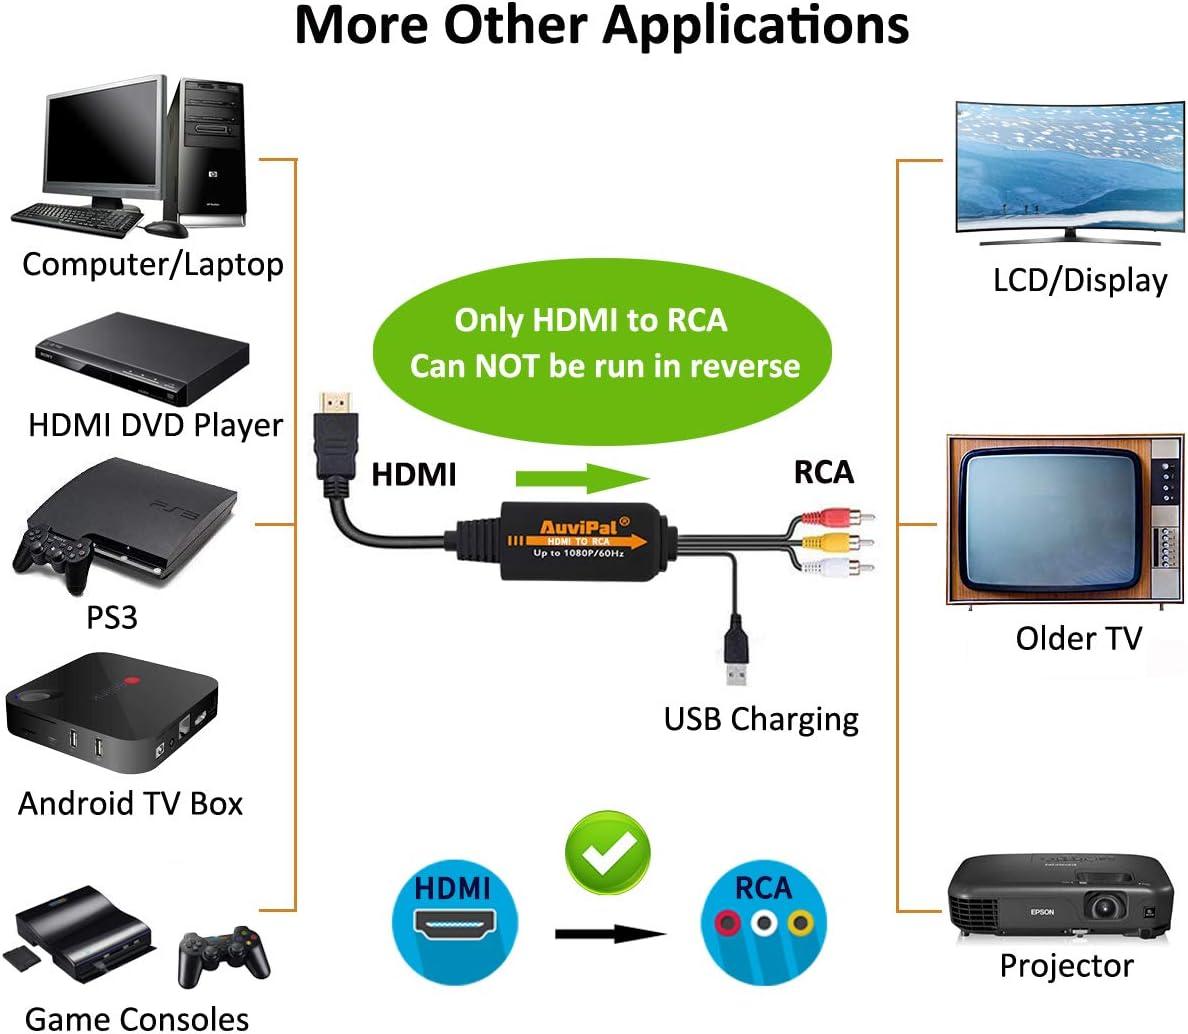 Cable convertidor HDMI a AV, convertidor de HDMI a RCA de AuviPal, compatible con 1080p para Amazon Fire Stick, Apple TV, Roku TV Stick, Chromecast, Mini PC, portátil y más: Amazon.es: Electrónica